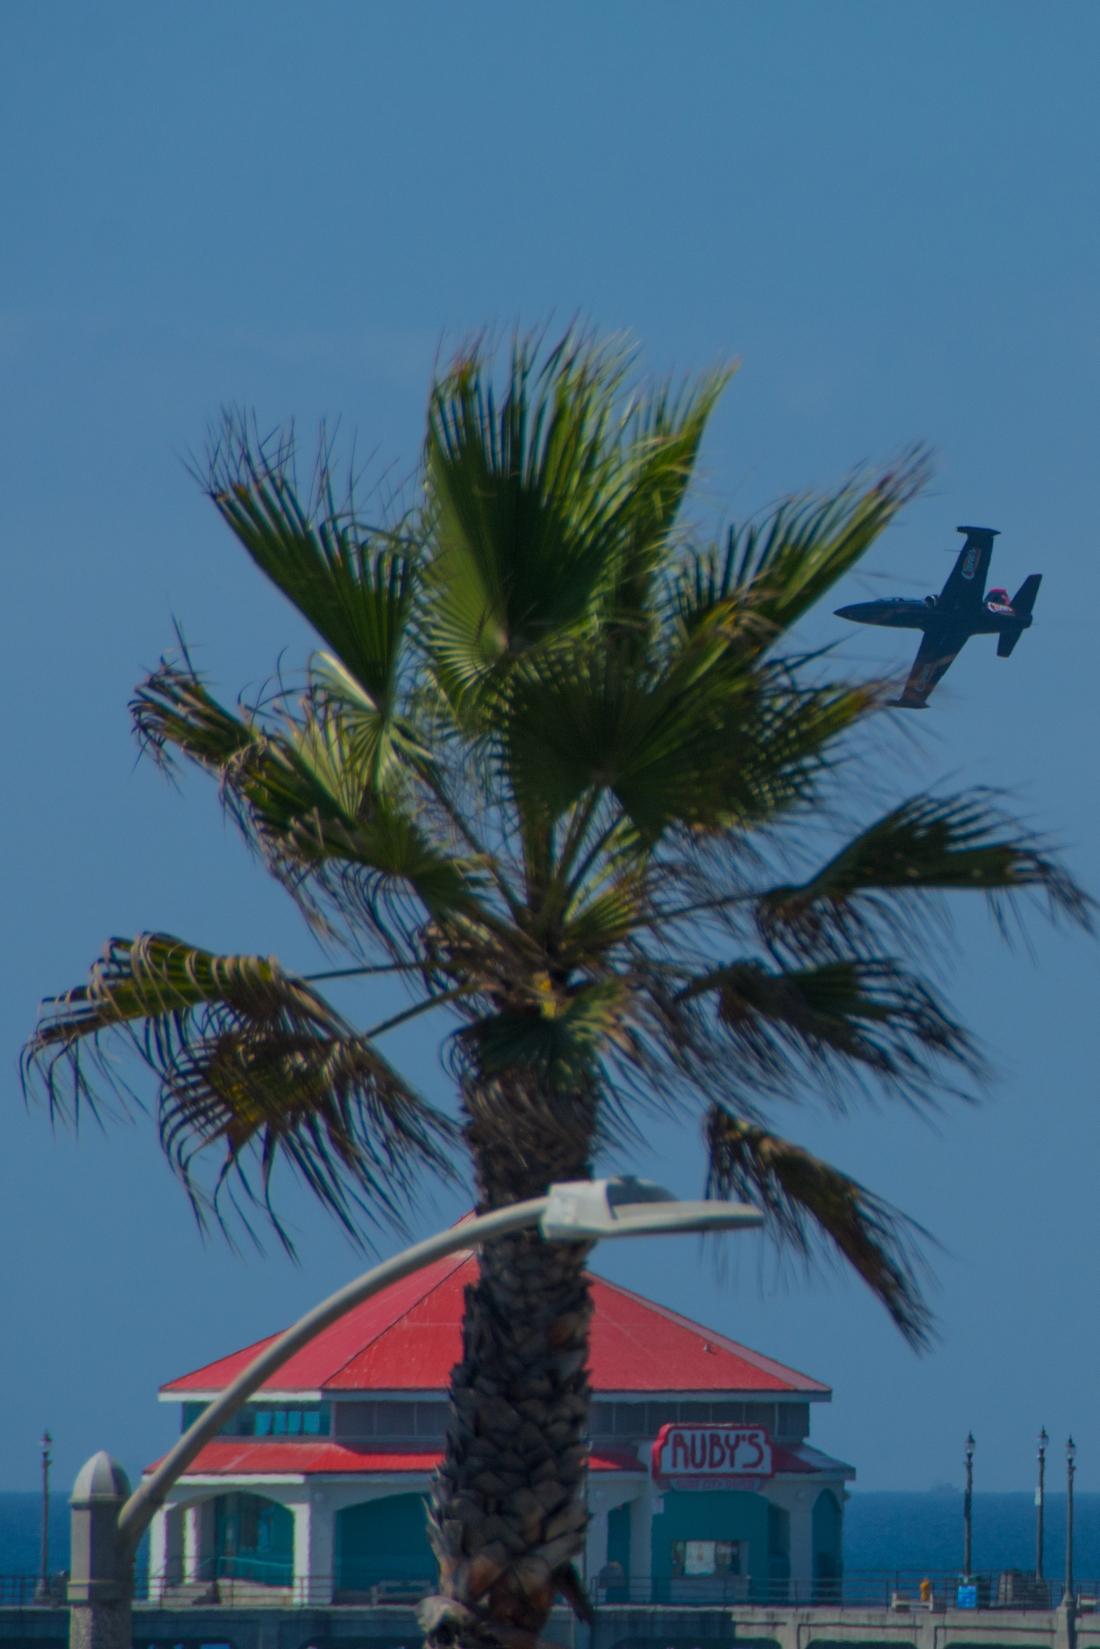 Jet Plane Over Rubies